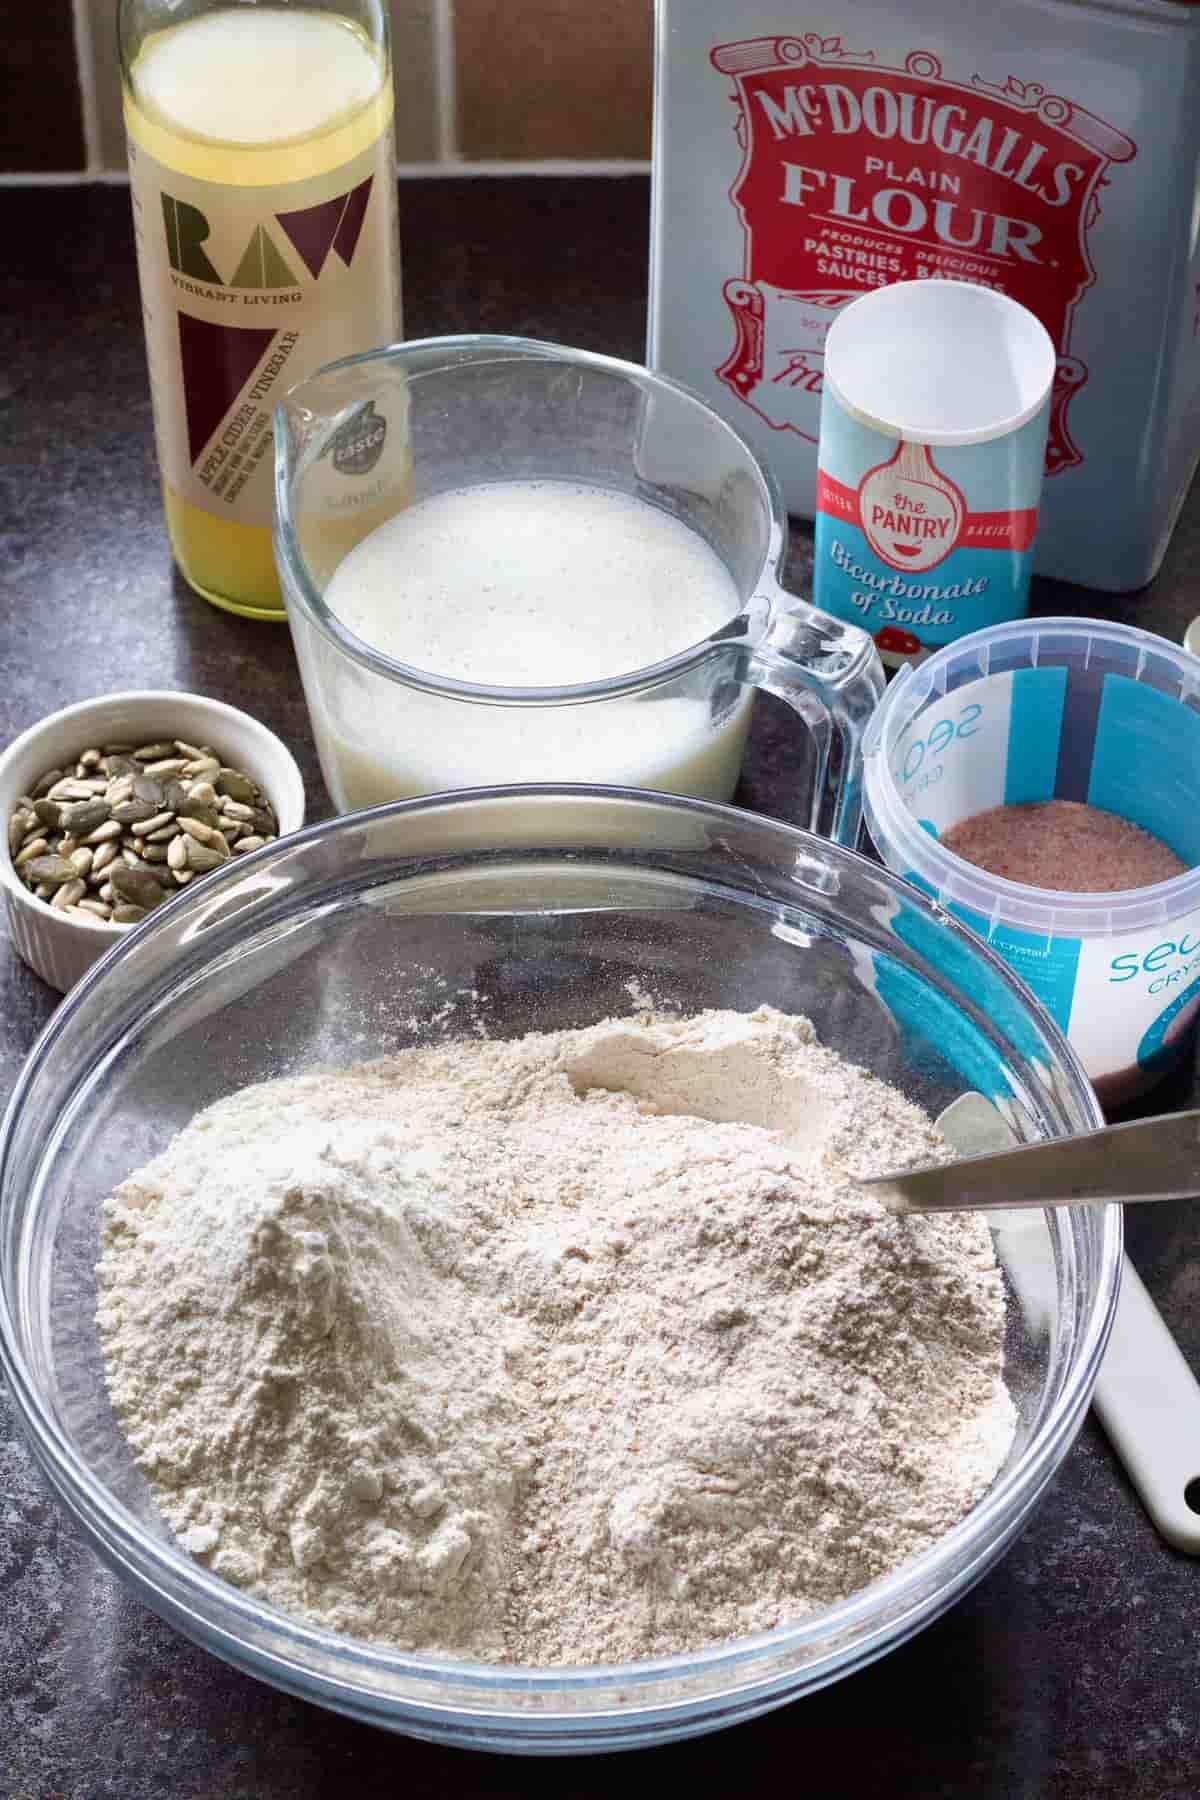 Ingredients for baking vegan soda bread.